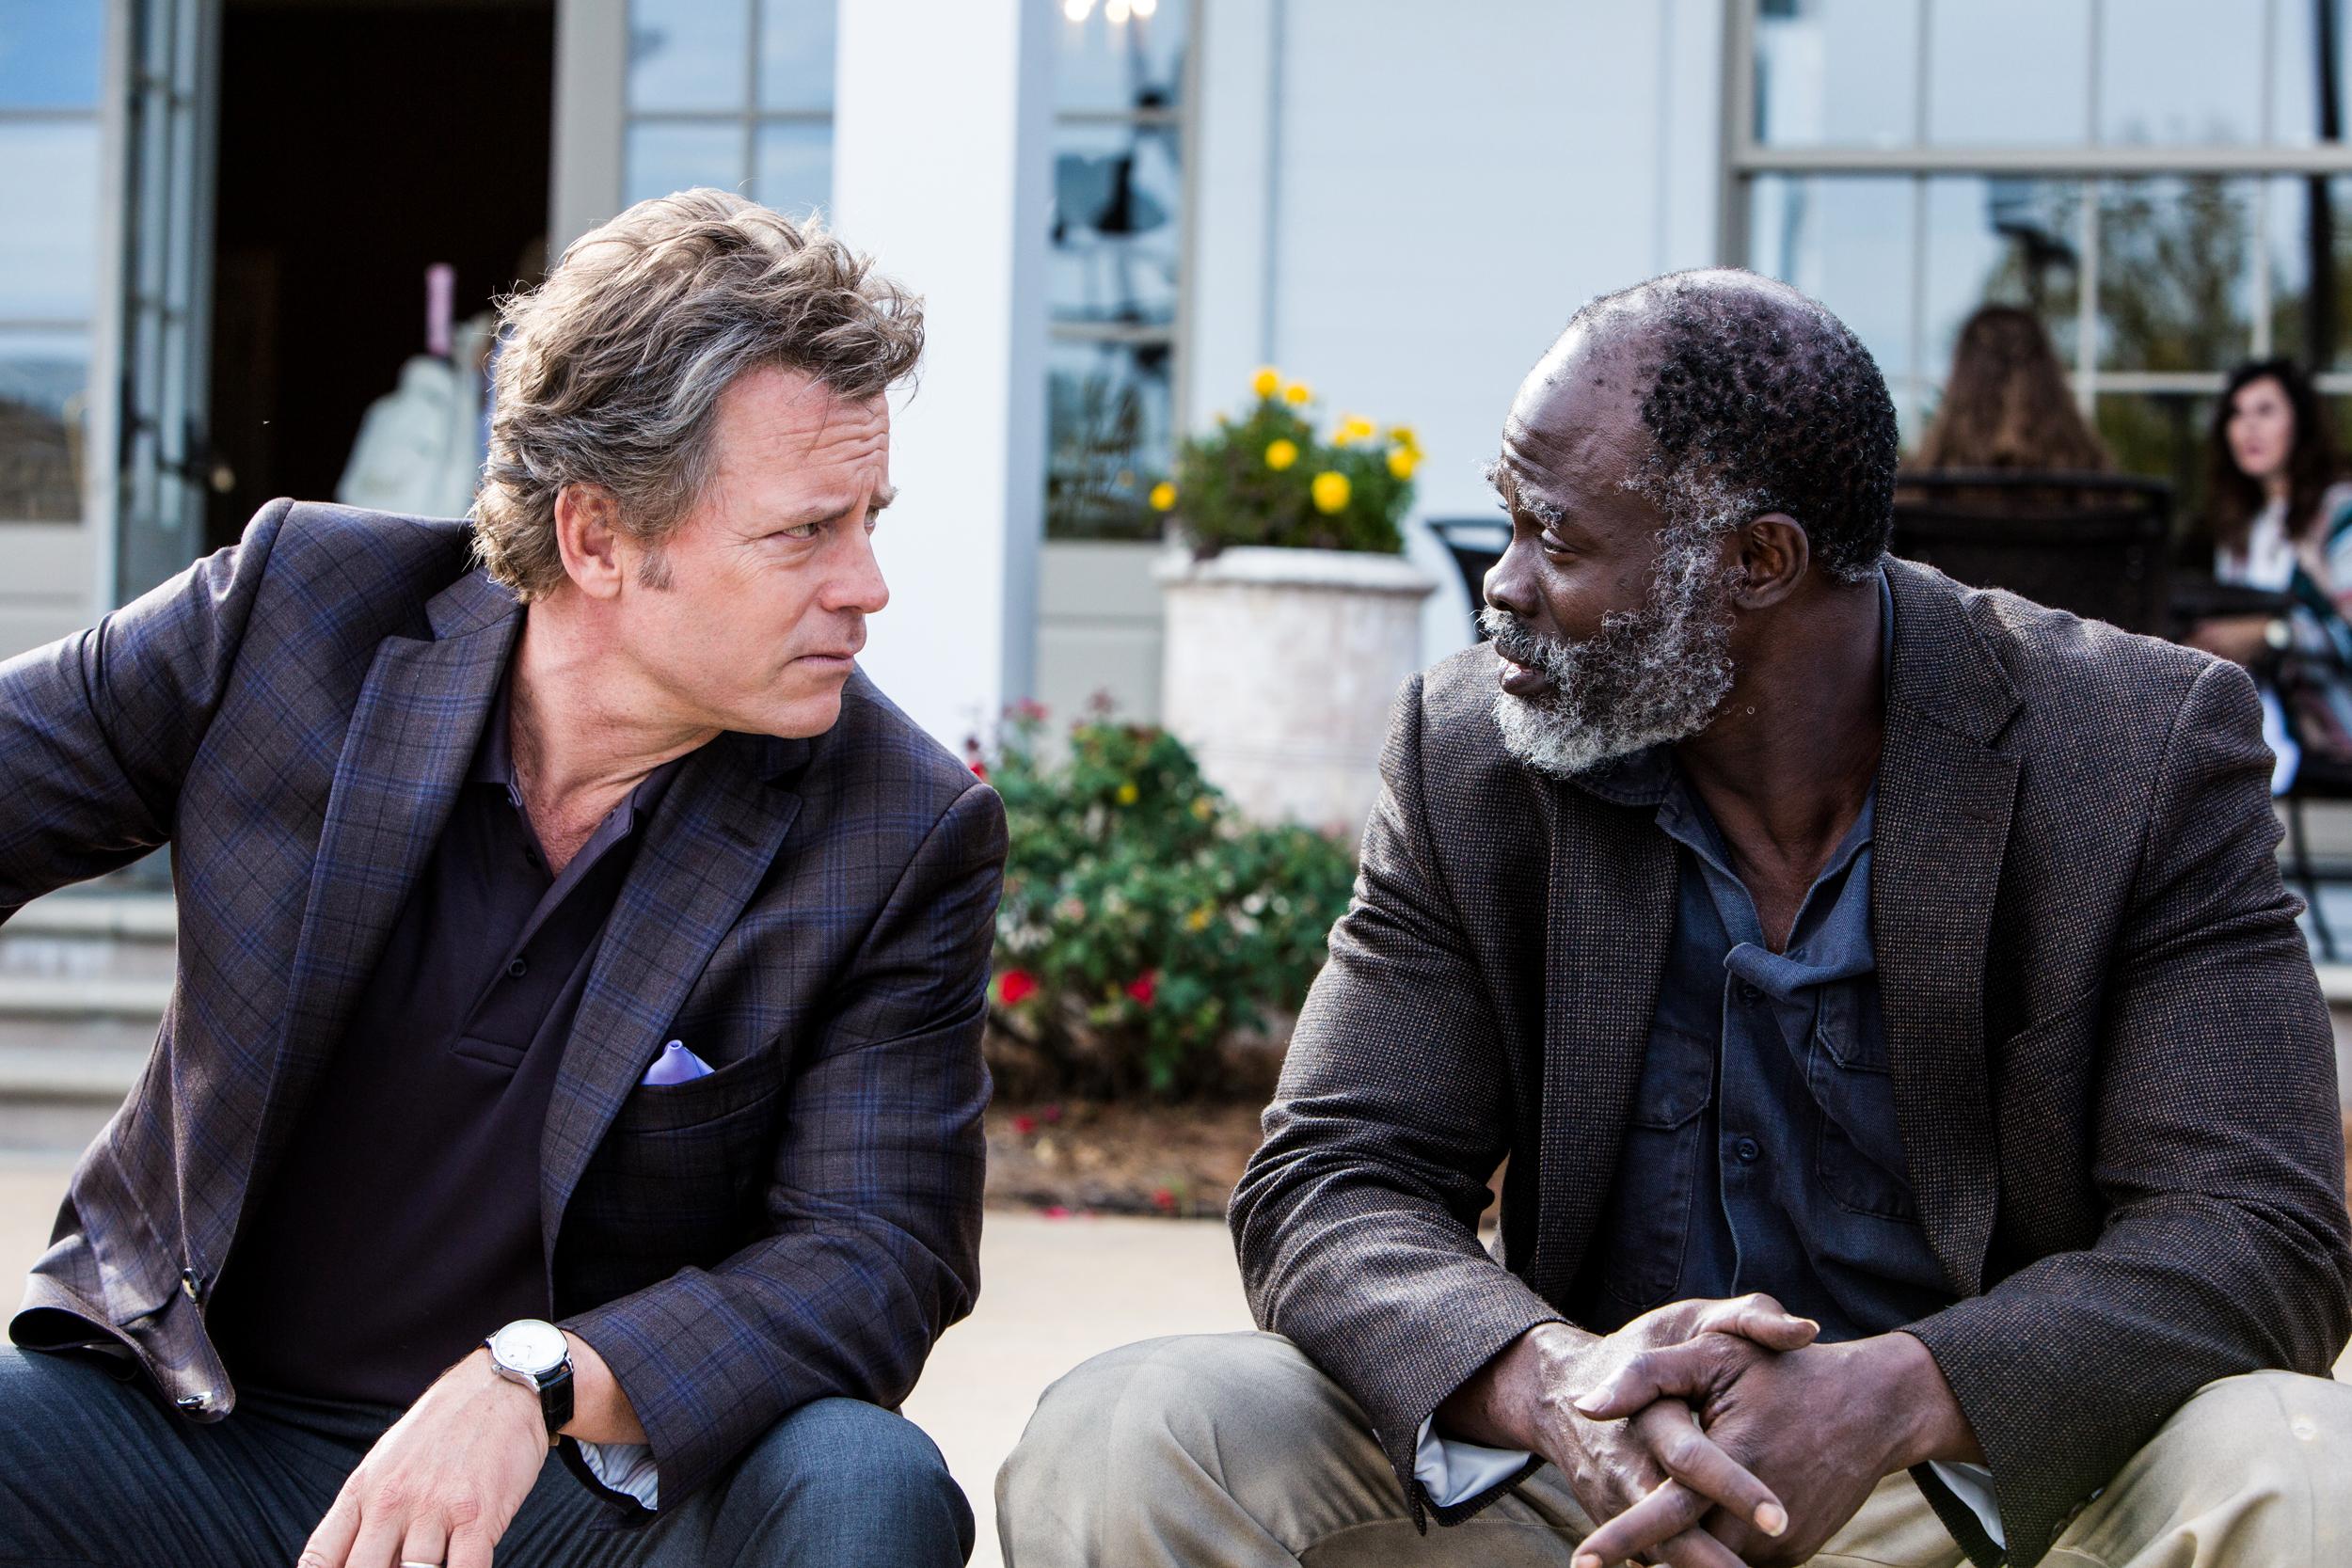 Image: Greg Kinnear and Djimon Hounsou in